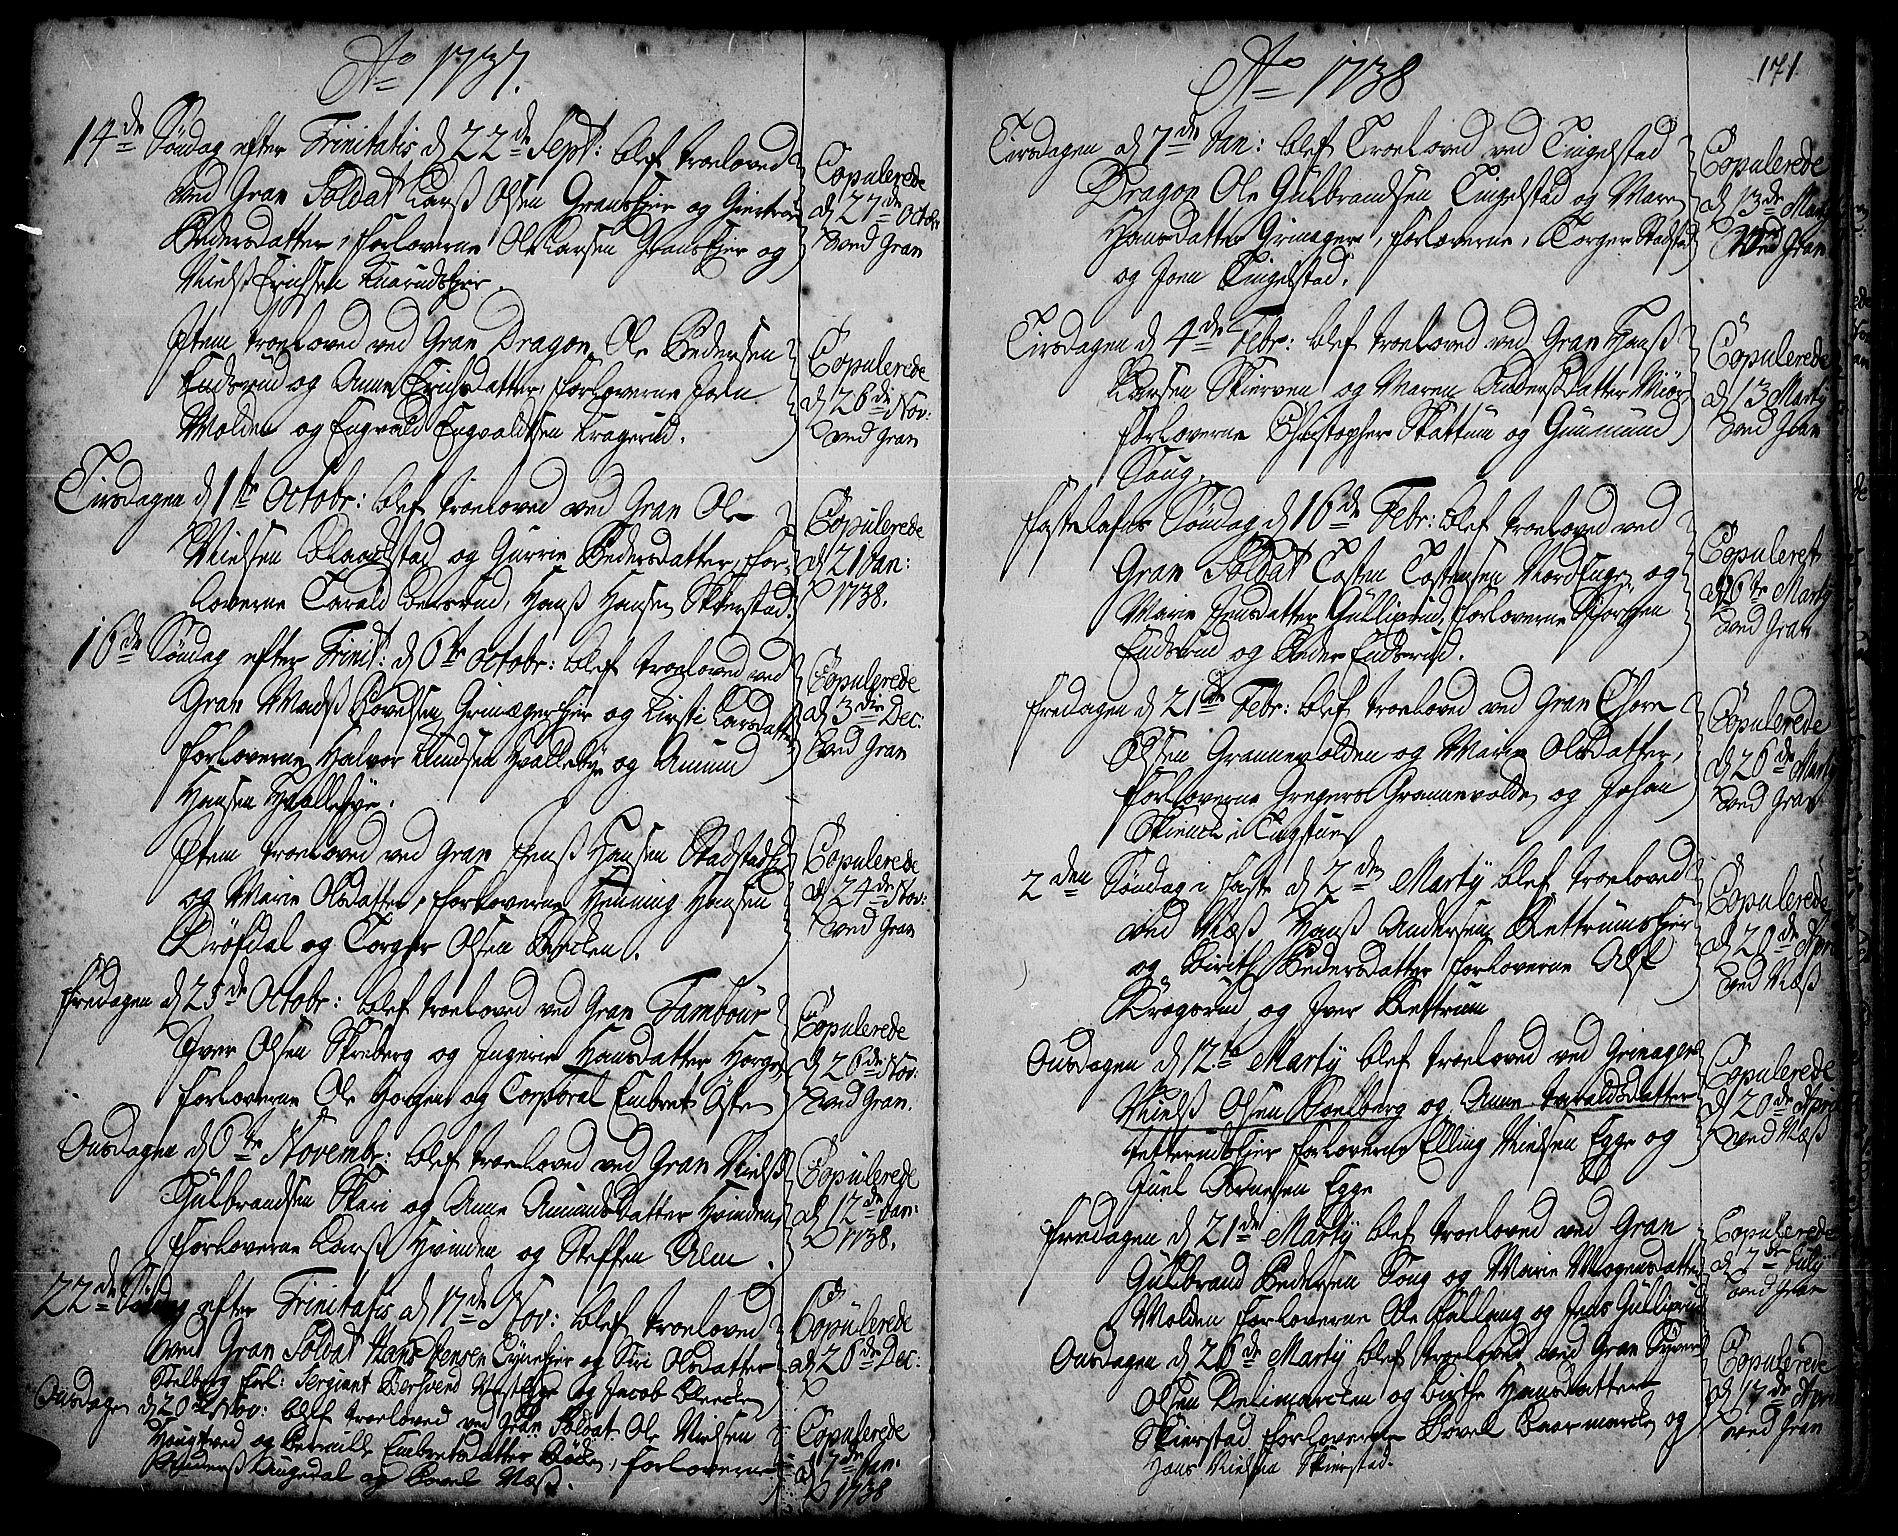 SAH, Gran prestekontor, Ministerialbok nr. 2, 1732-1744, s. 171